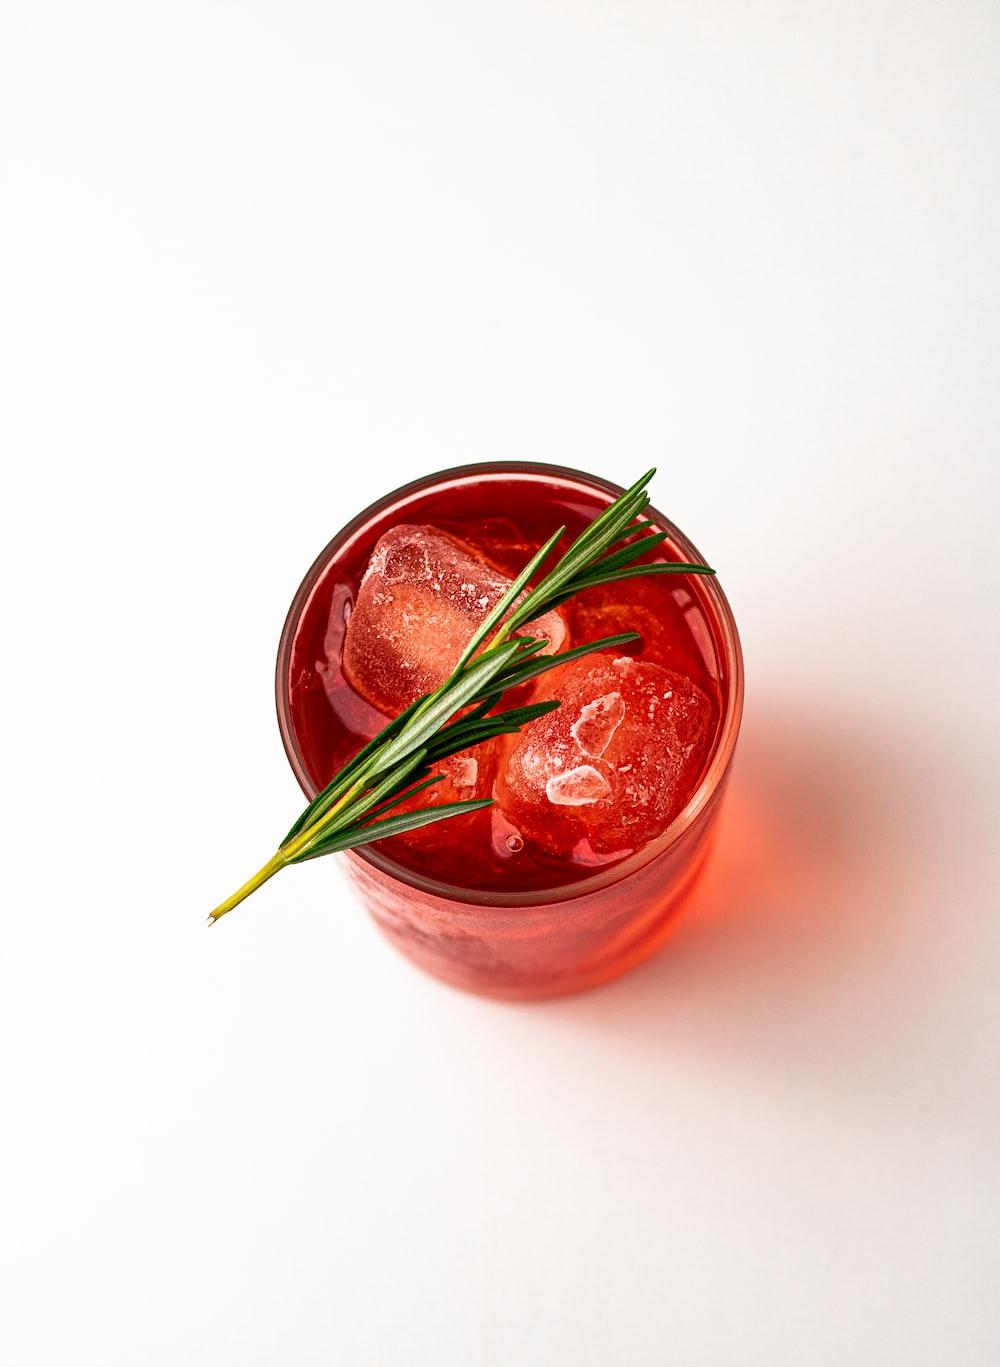 red liquid in clear glass jar